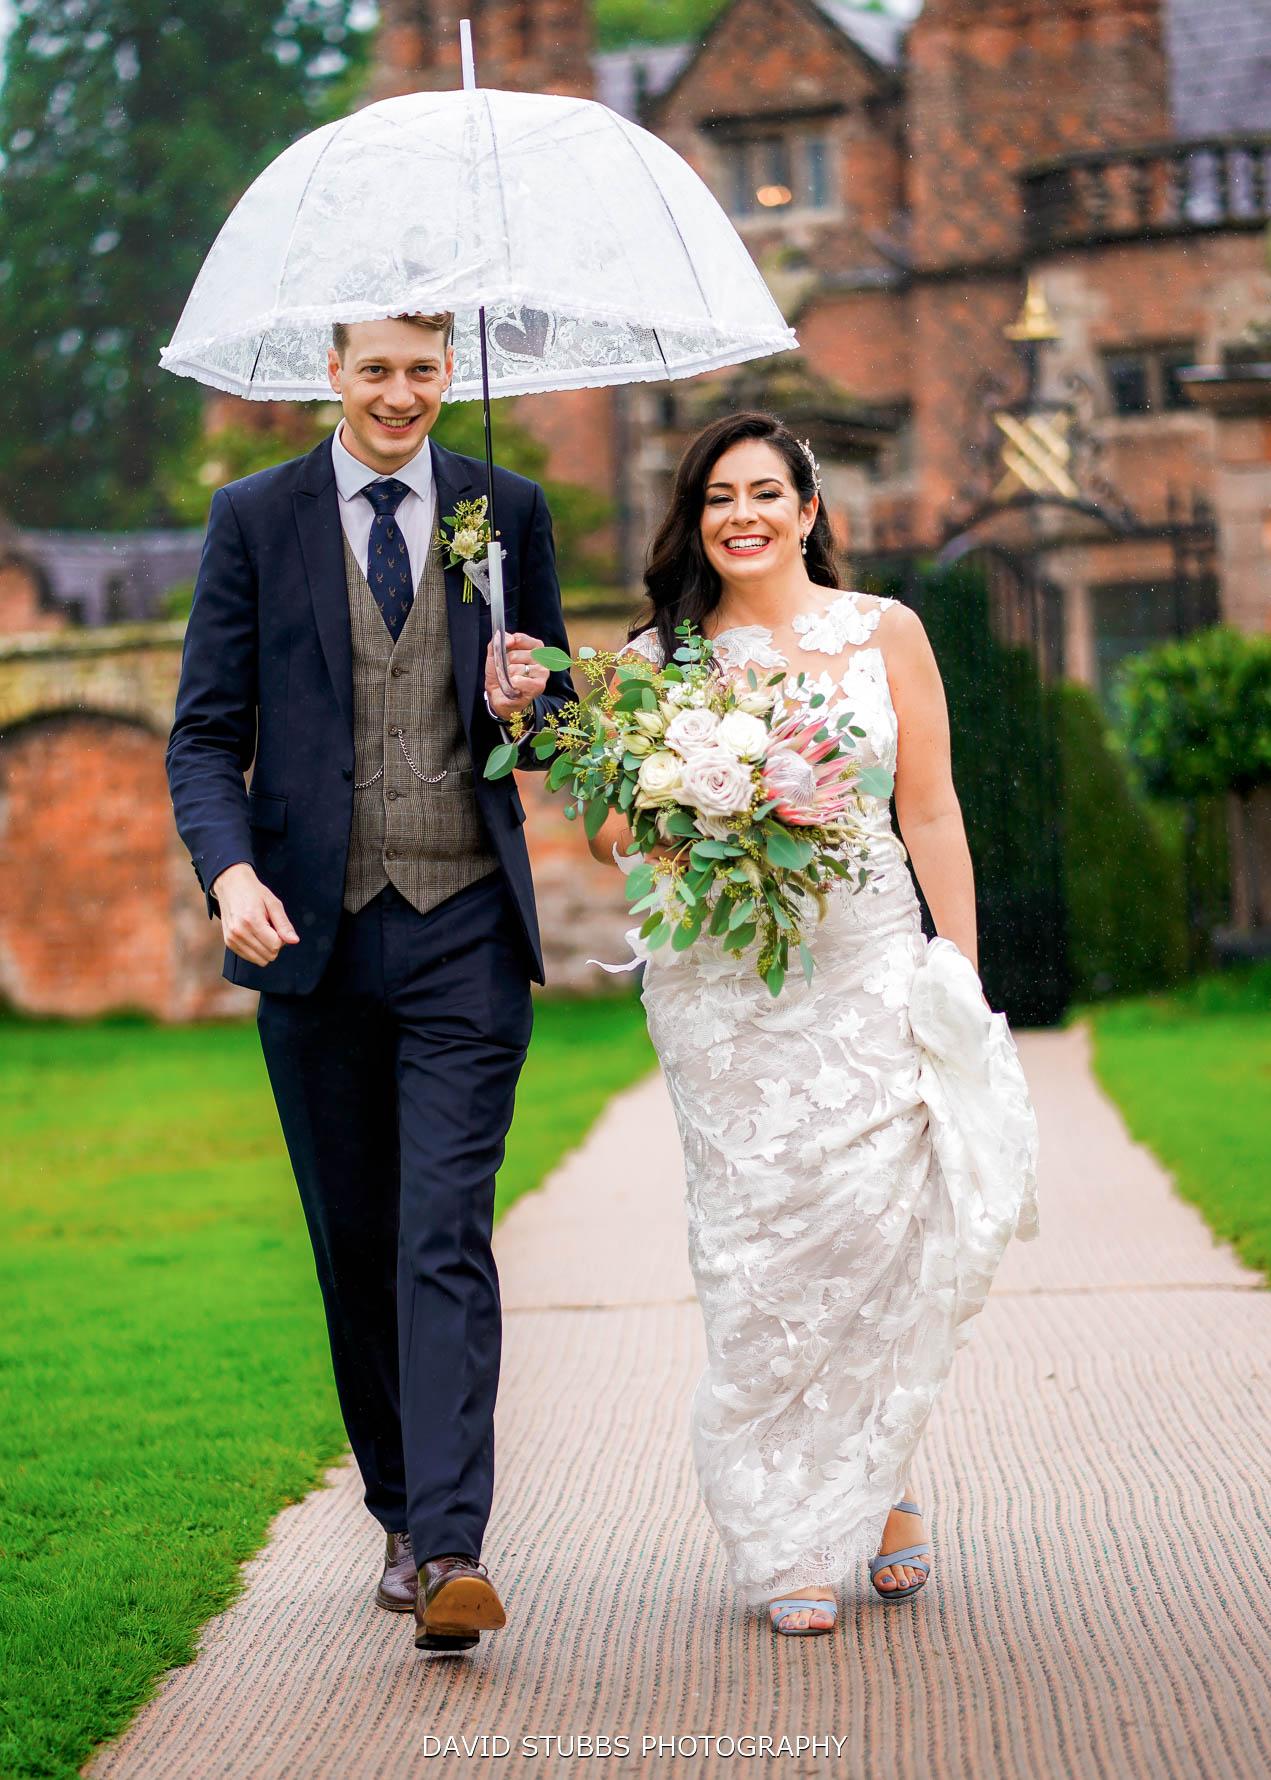 walking together to wedding breakfast in portrait